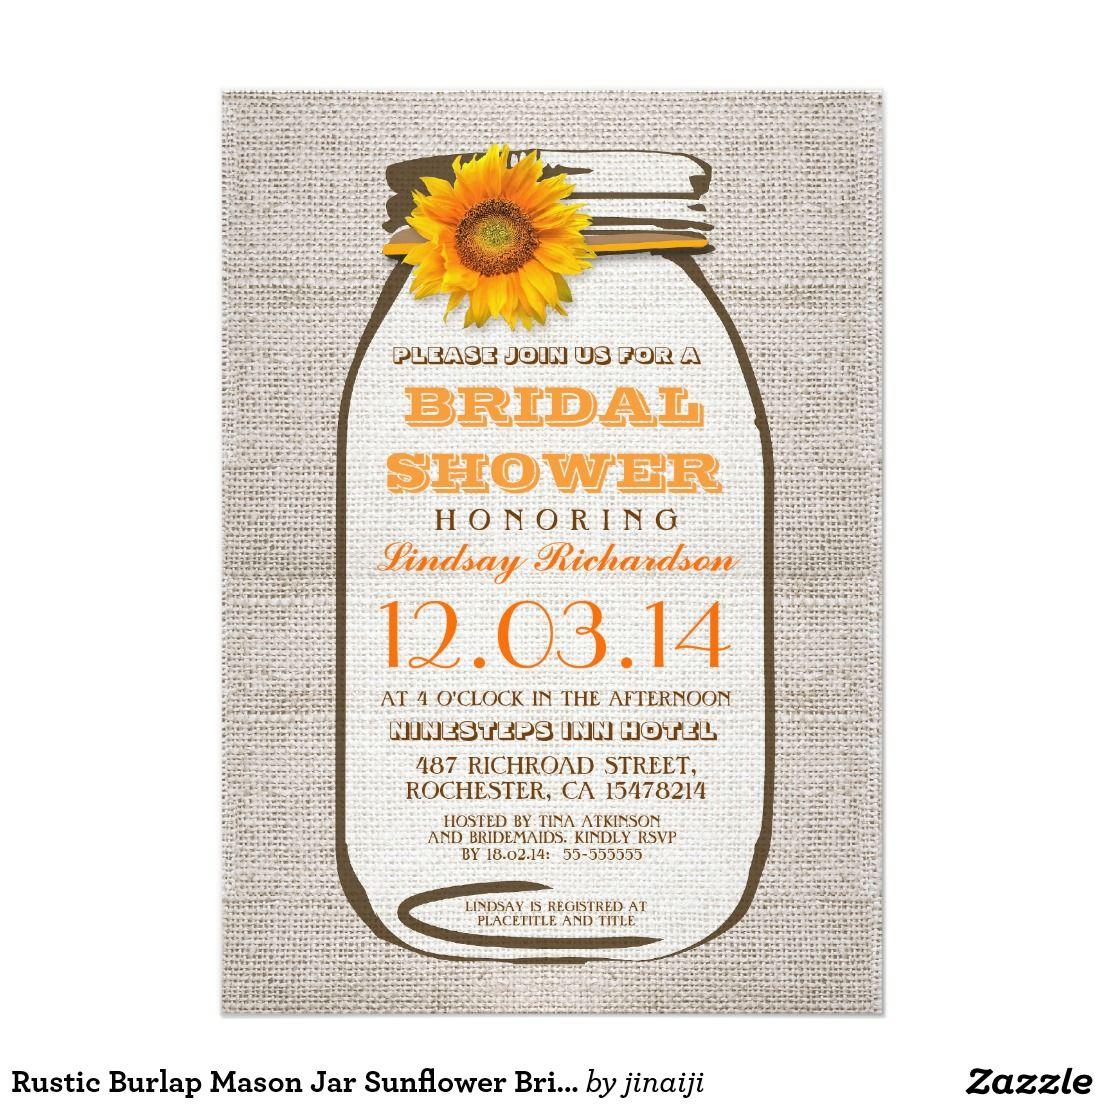 Rustic Burlap Mason Jar Sunflower Bridal Shower | WEDDING: BRIDAL ...